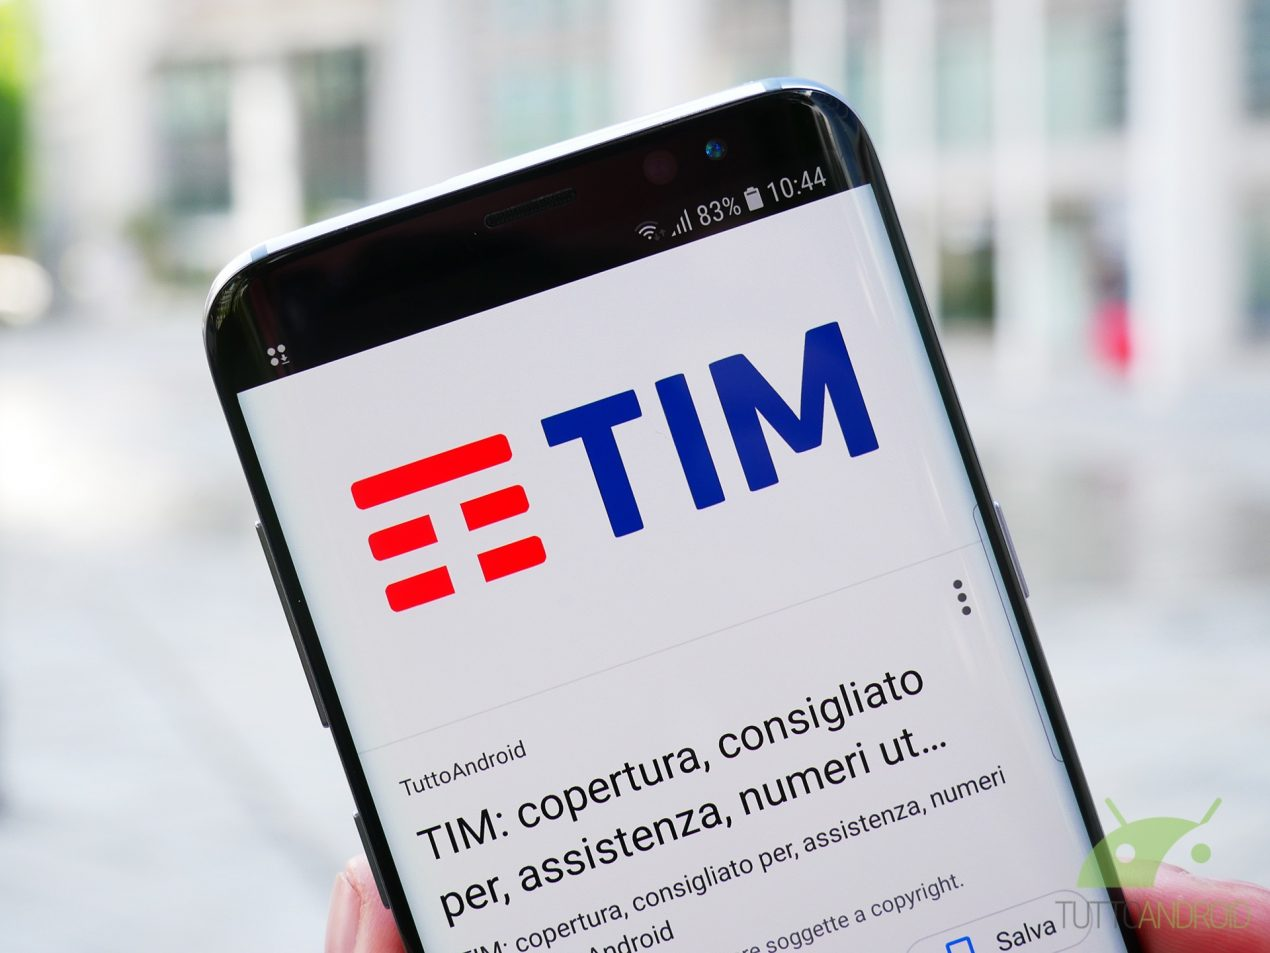 TIM regala 2 mesi gratis a chi attiva online le offerte TIM Connect